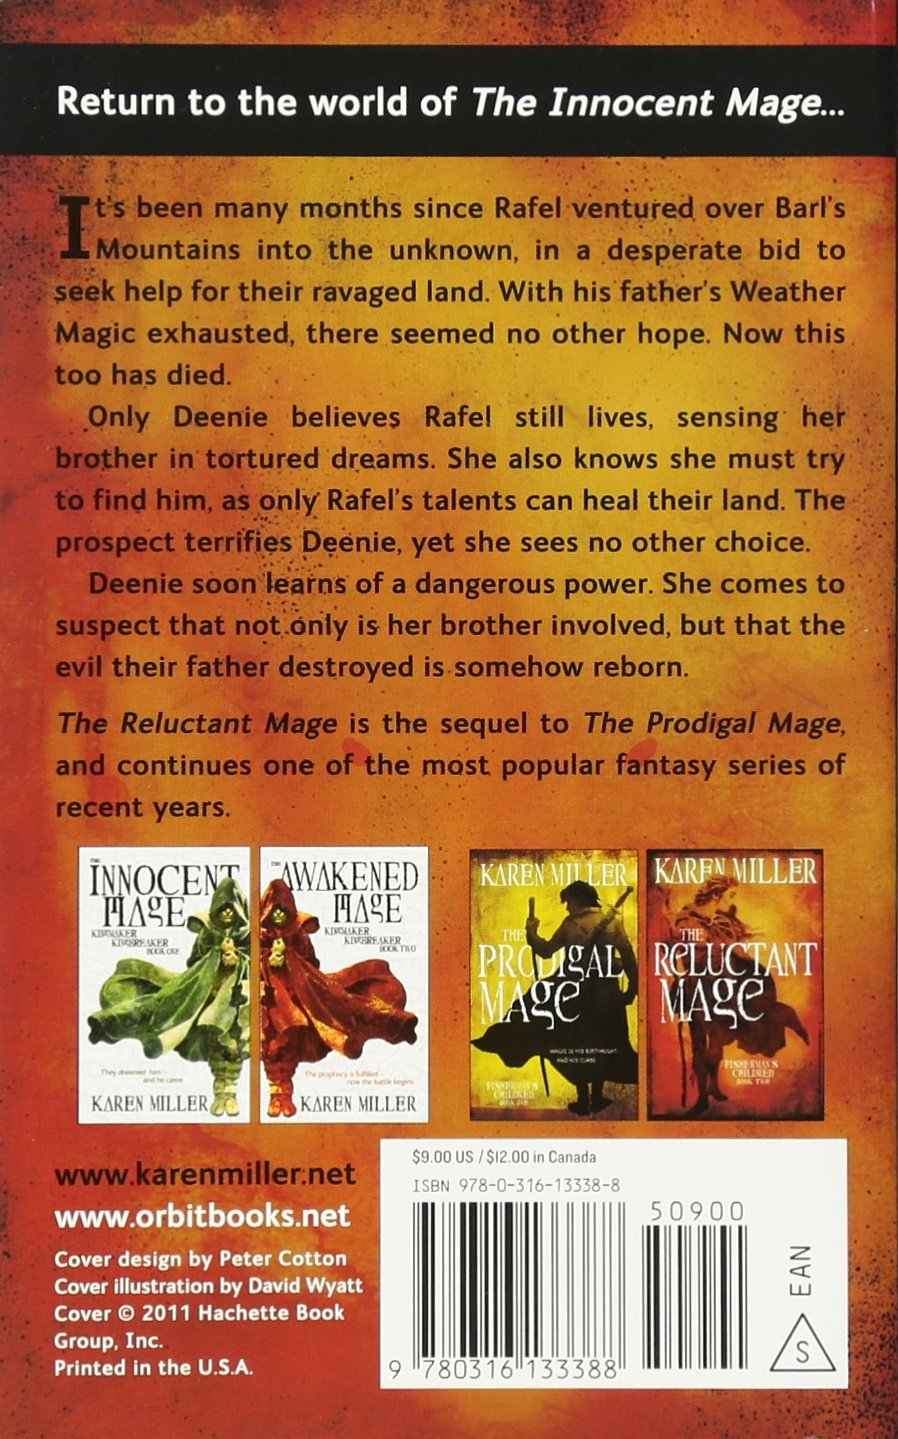 The Reluctant Mage (fisherman's Children): Karen Miller: 9780316133388:  Amazon: Books